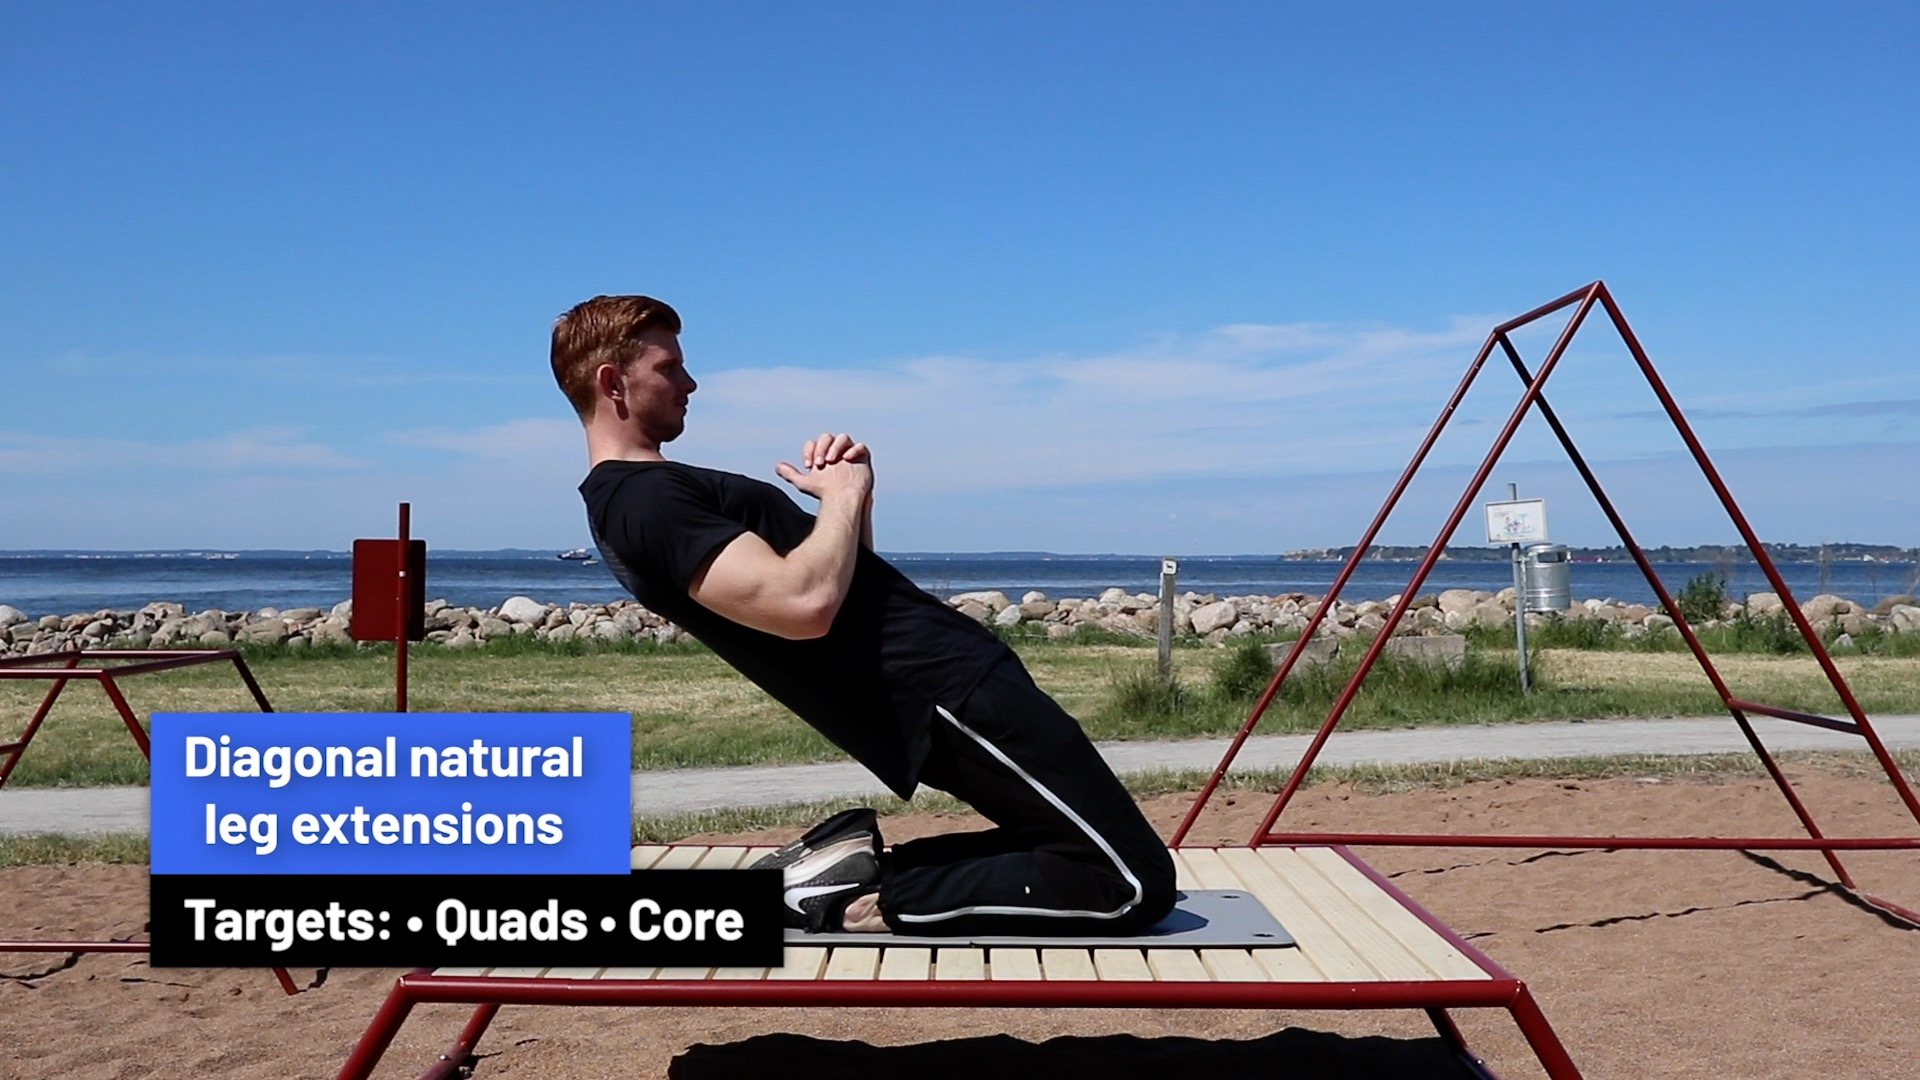 Diagonal natural leg extensions